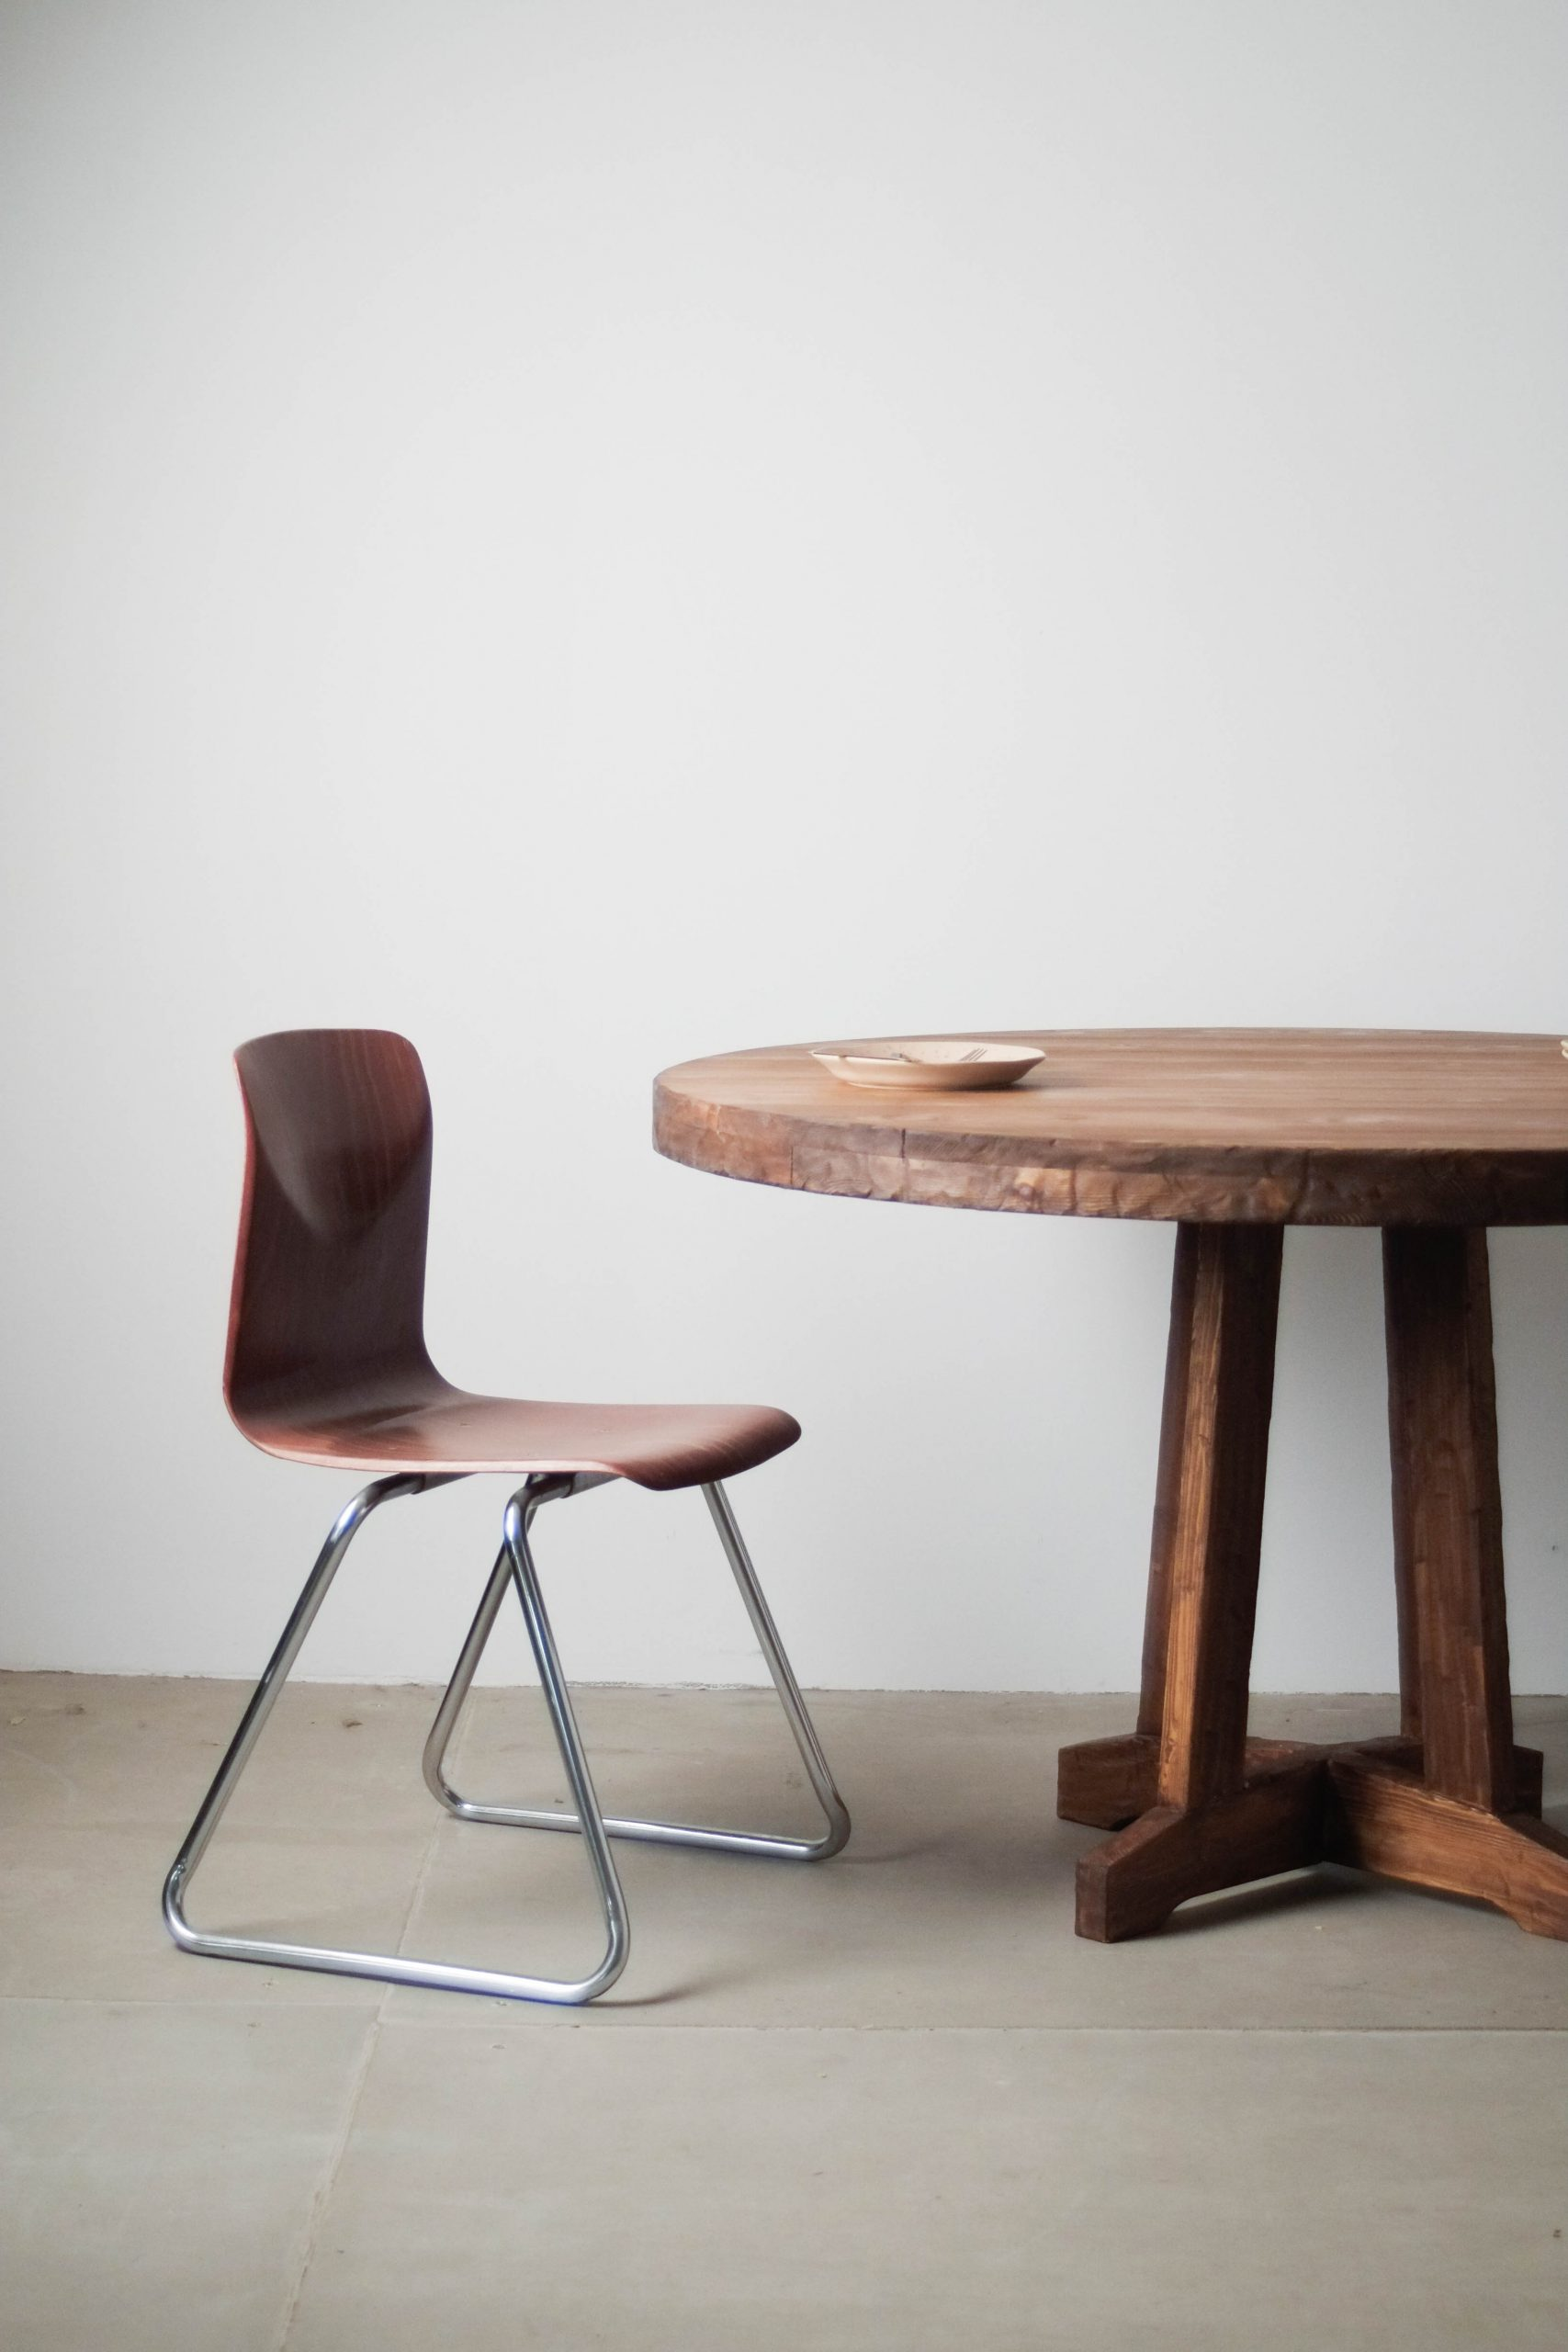 mesa con silla de diseño redonda de madera calidad fabricada a mano